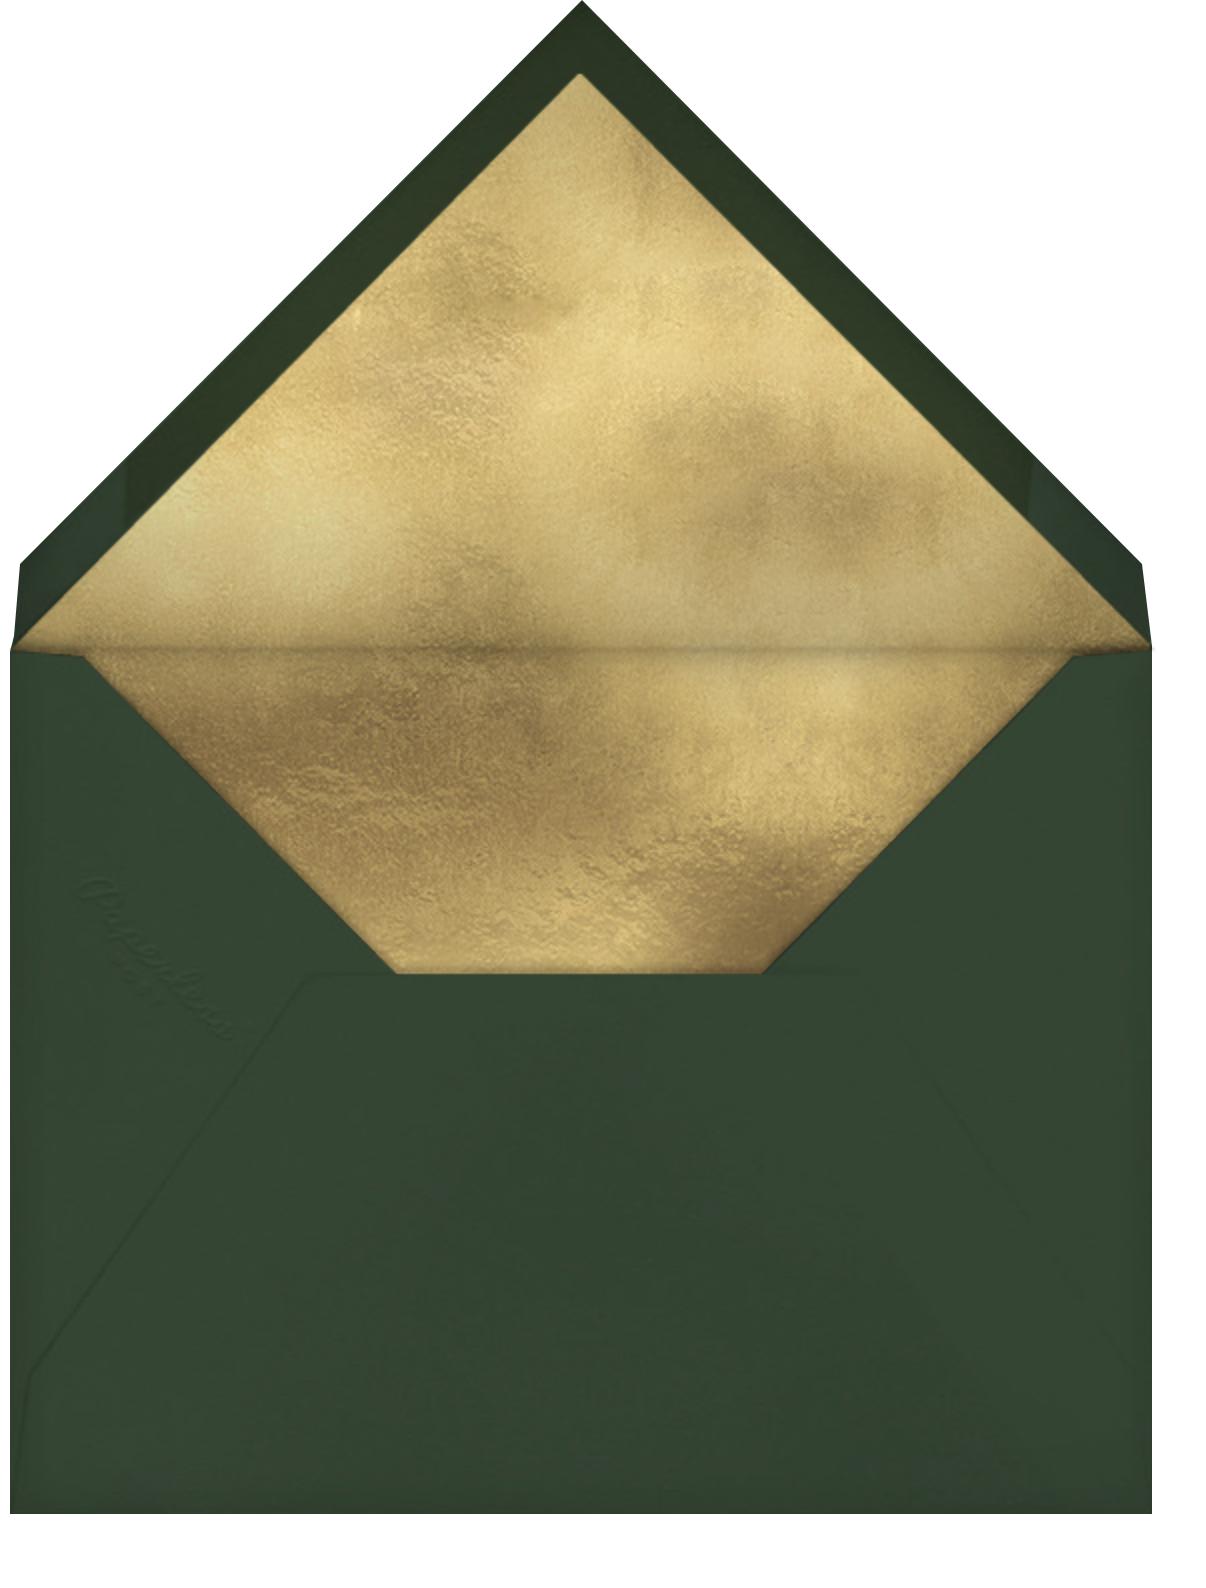 Greenery Frame - Greenwood - Paperless Post - Holiday cards - envelope back